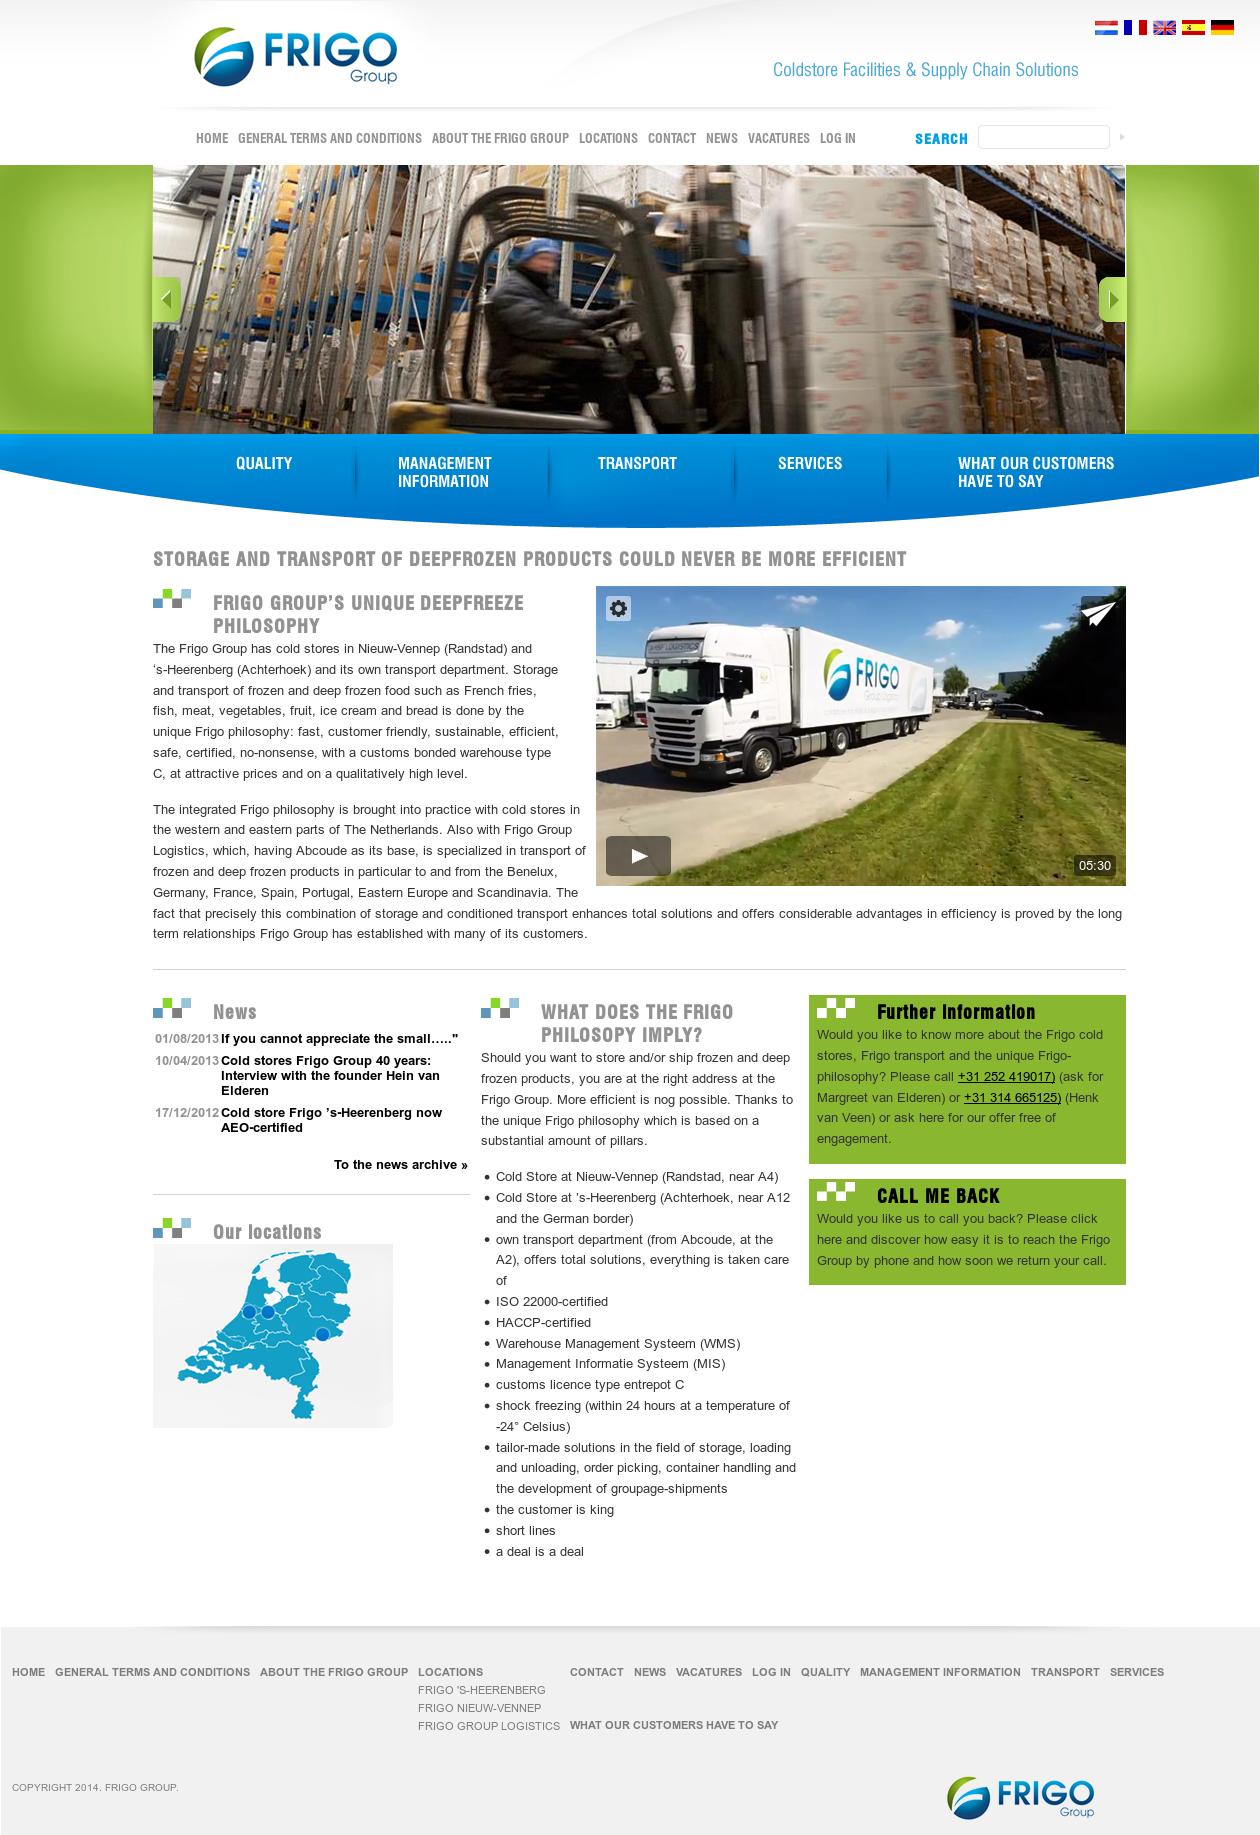 55733b5cd67 Frigofrozentransport Competitors, Revenue and Employees - Owler Company  Profile